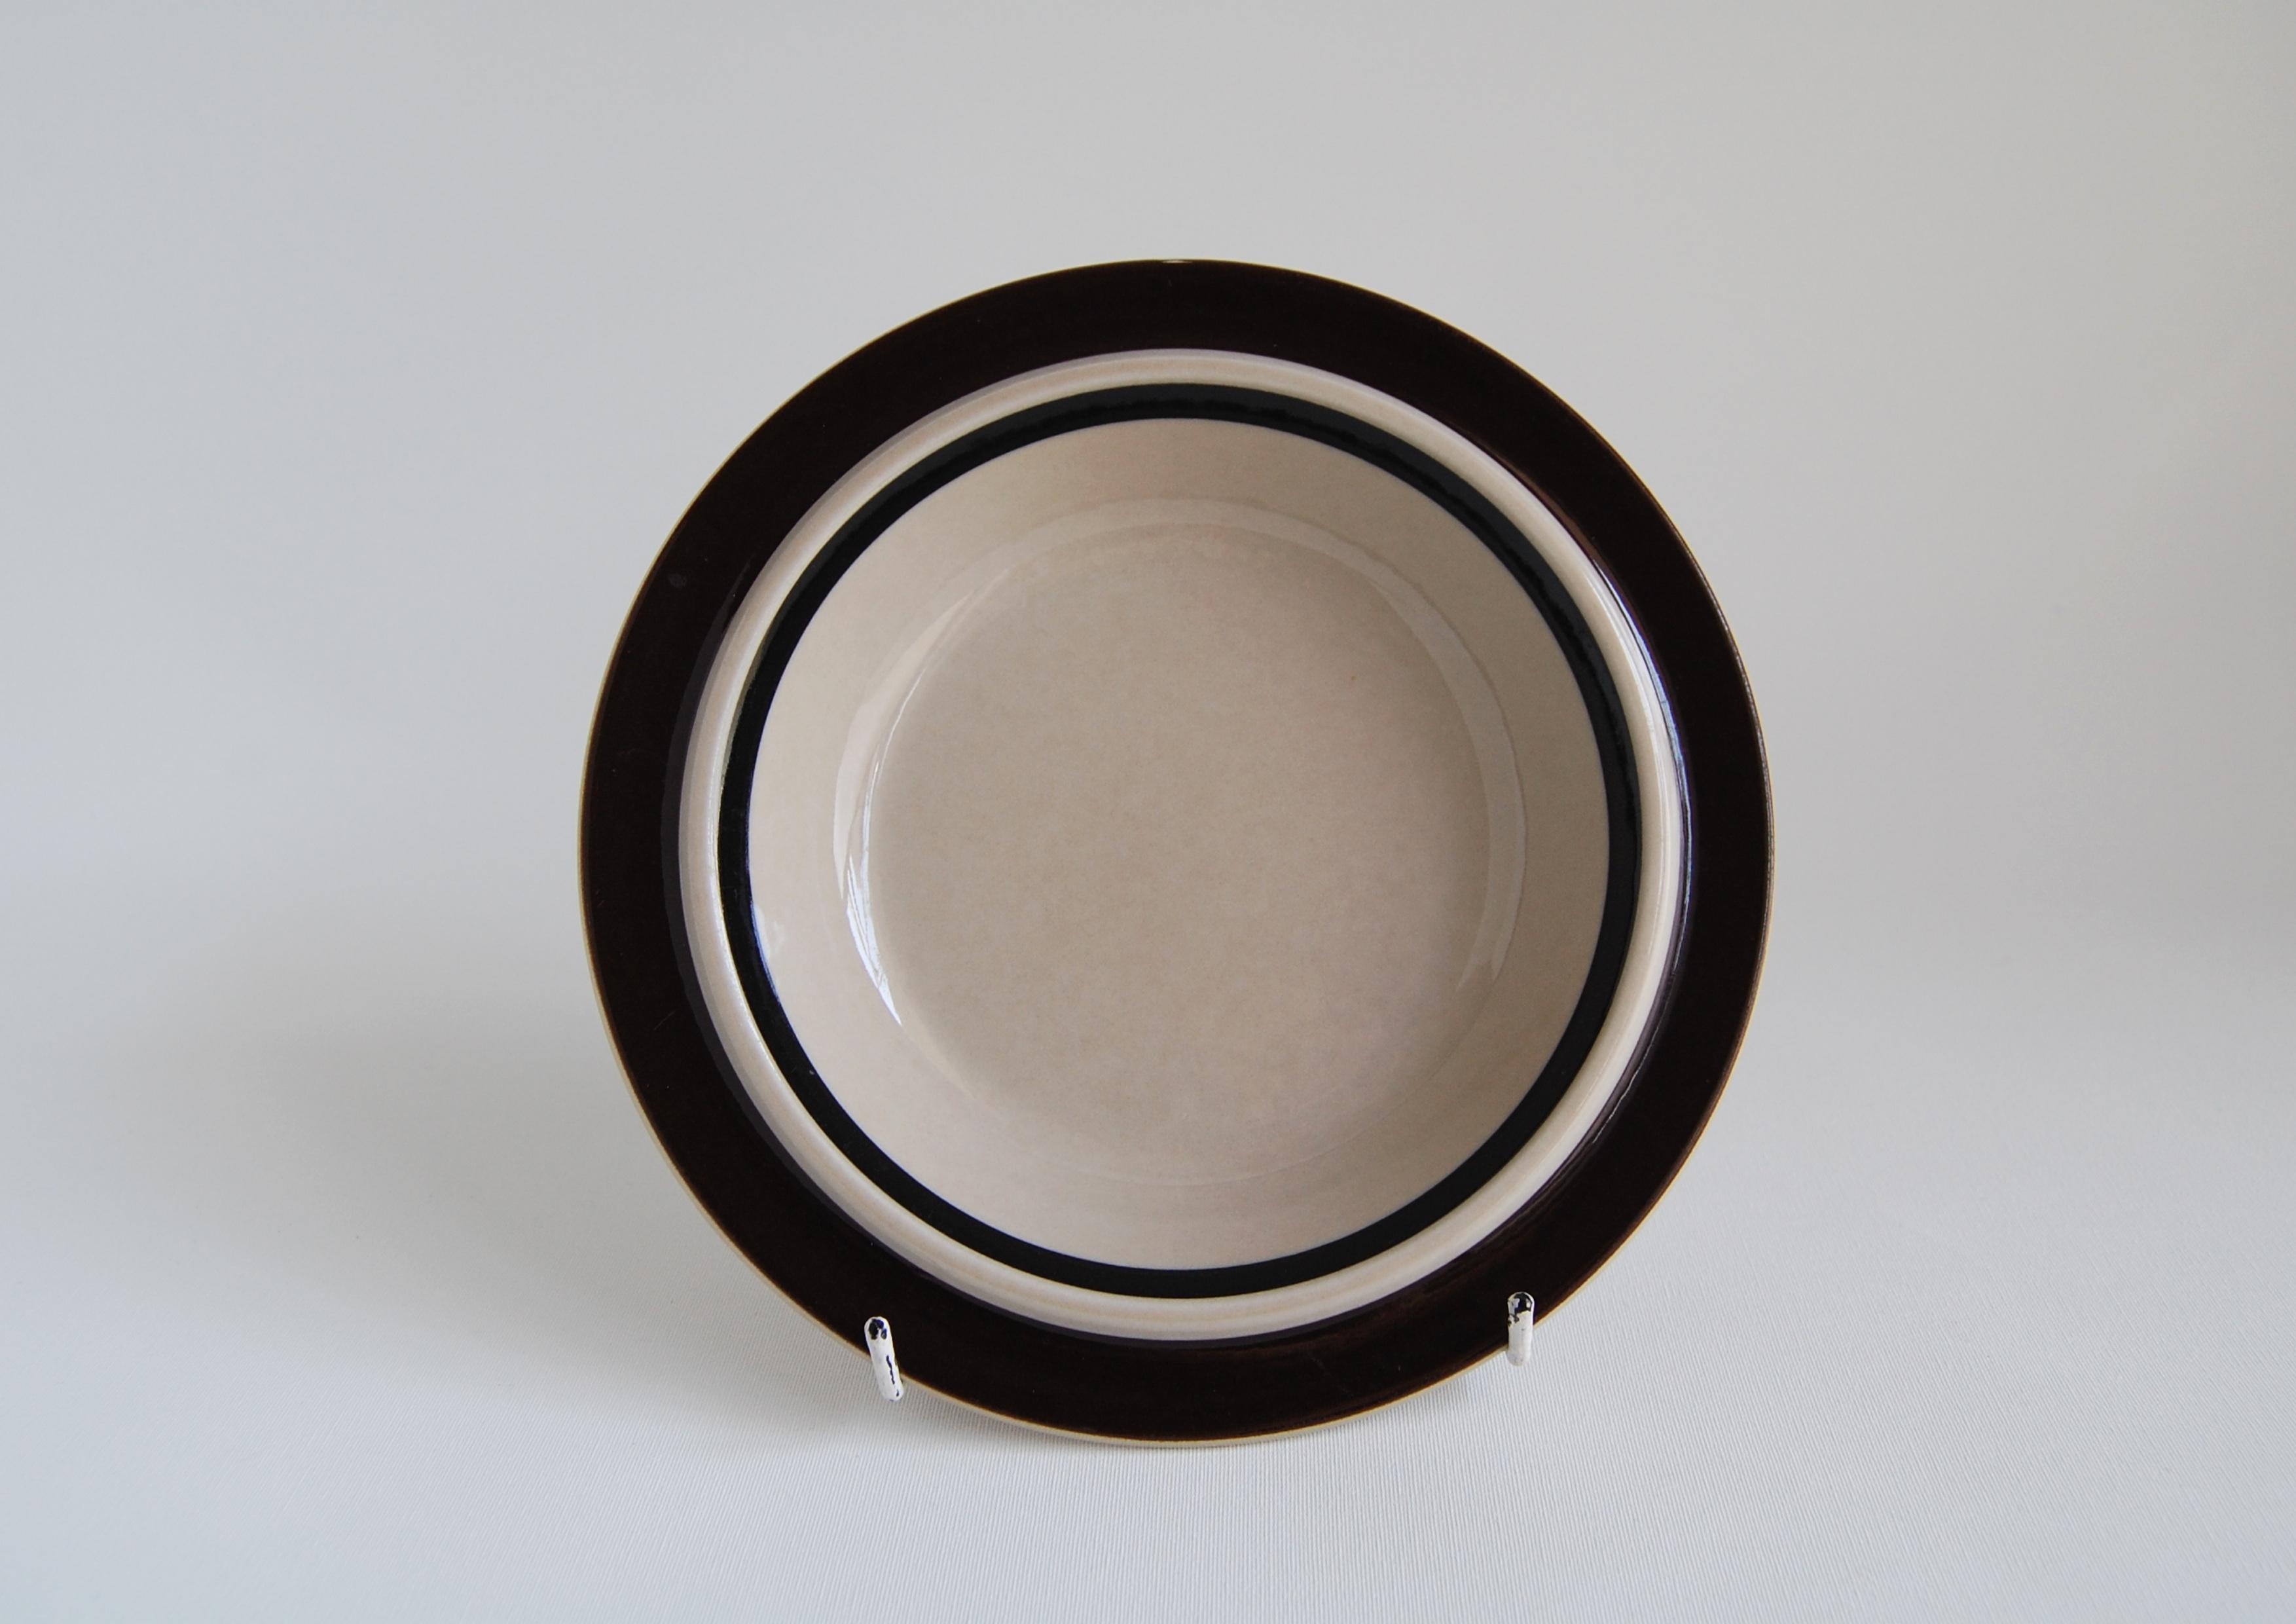 ARABIA/アラビア Ruija/ルイヤ 20cmスープボウル 005